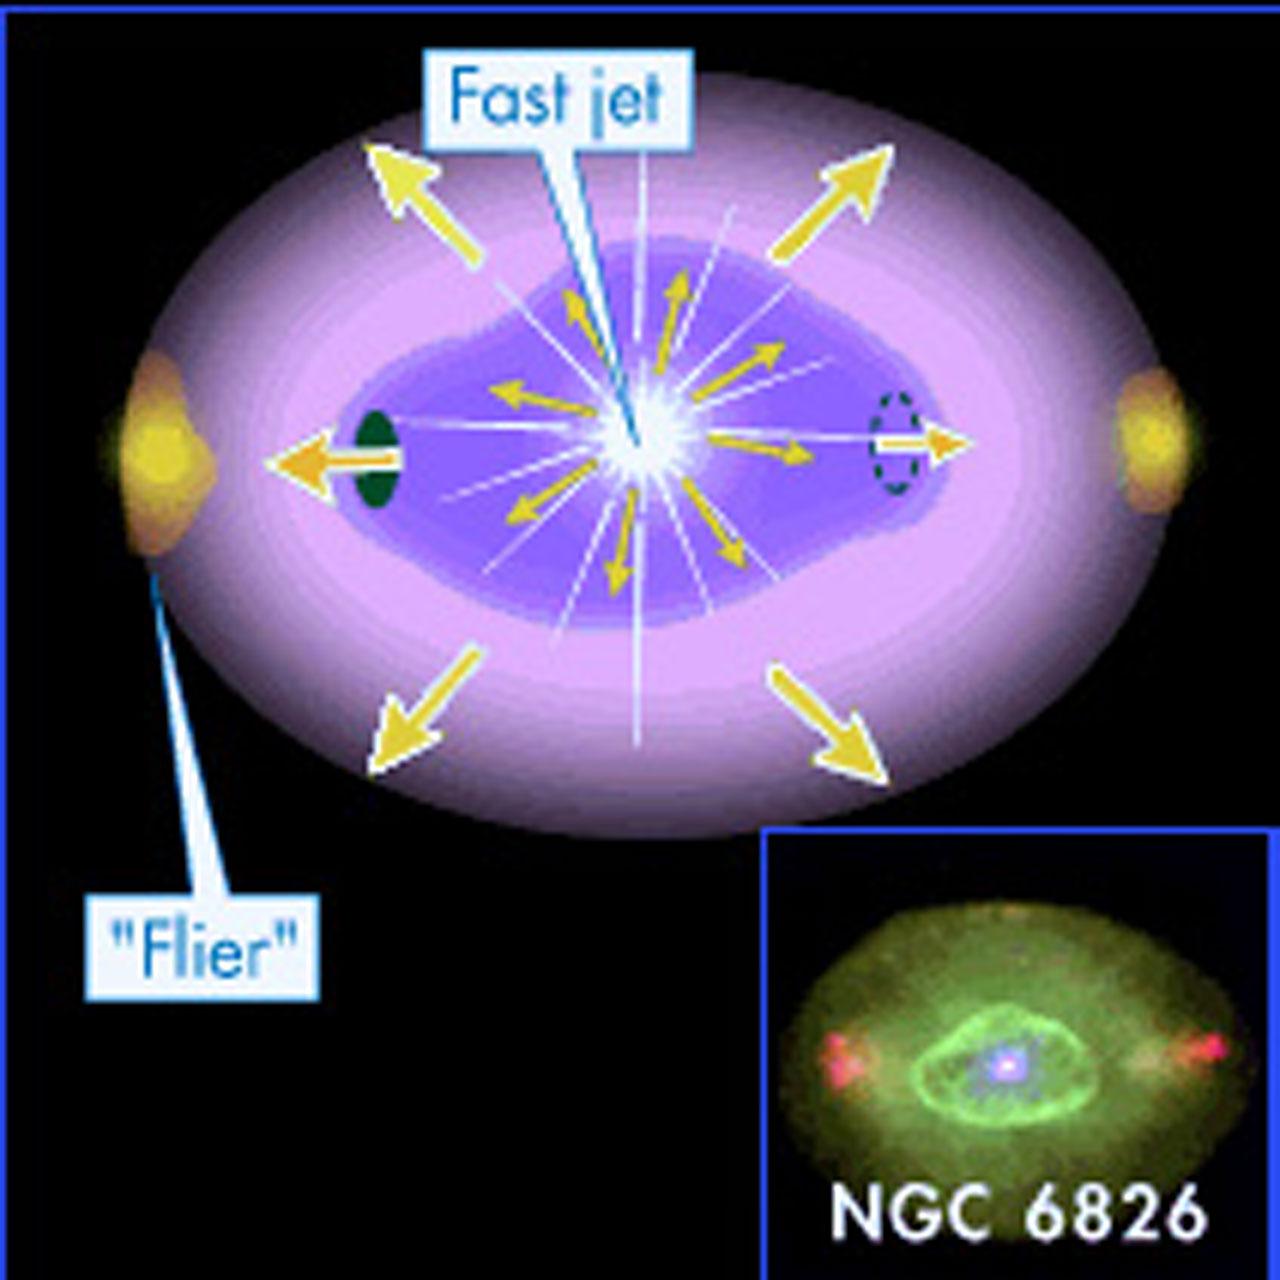 NGC 6826 illustration